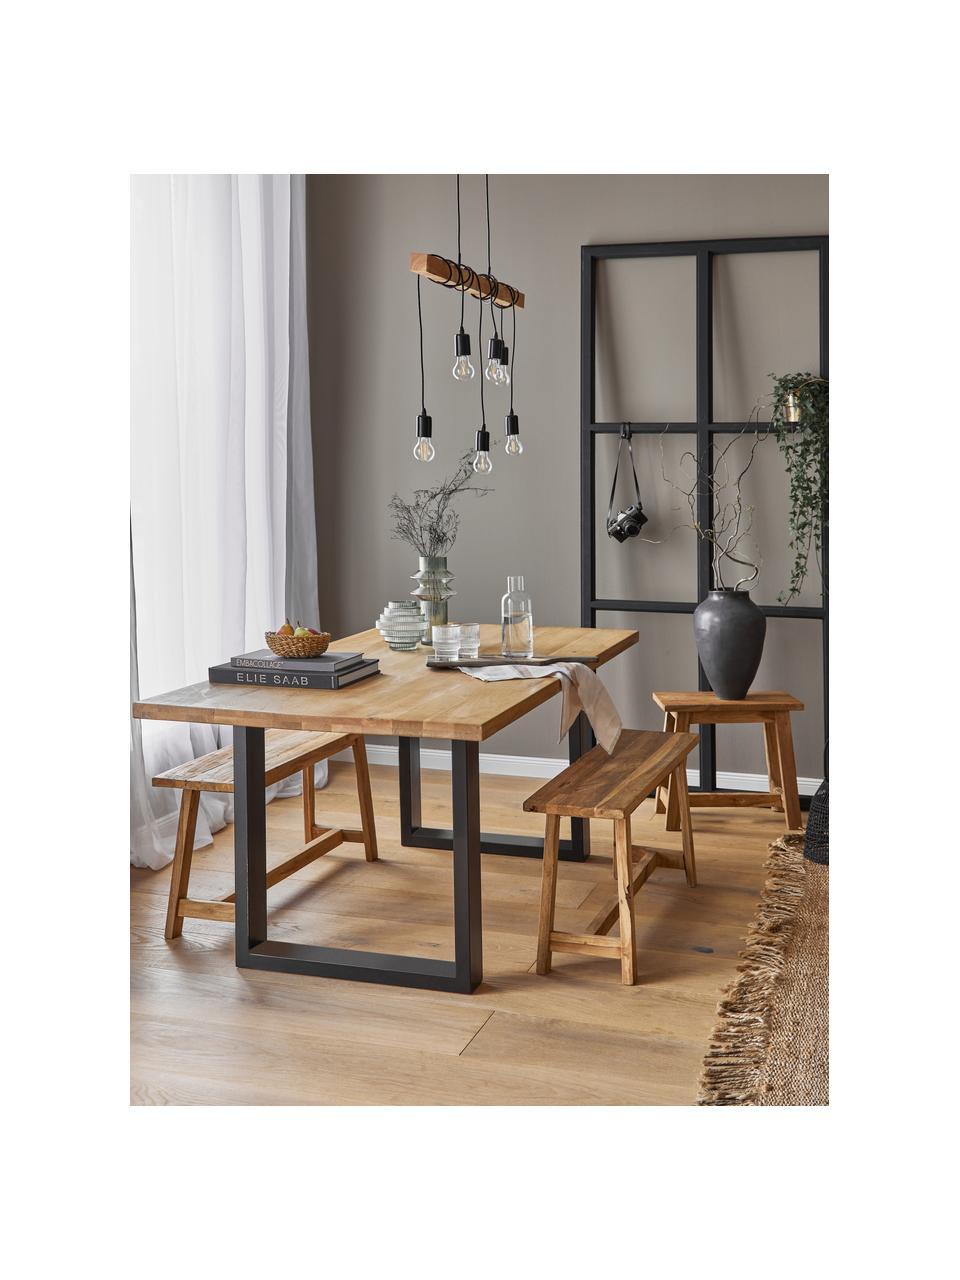 Grote hanglamp Townshend van hout, Zwart, houtkleurig, B 100  x D 10 cm